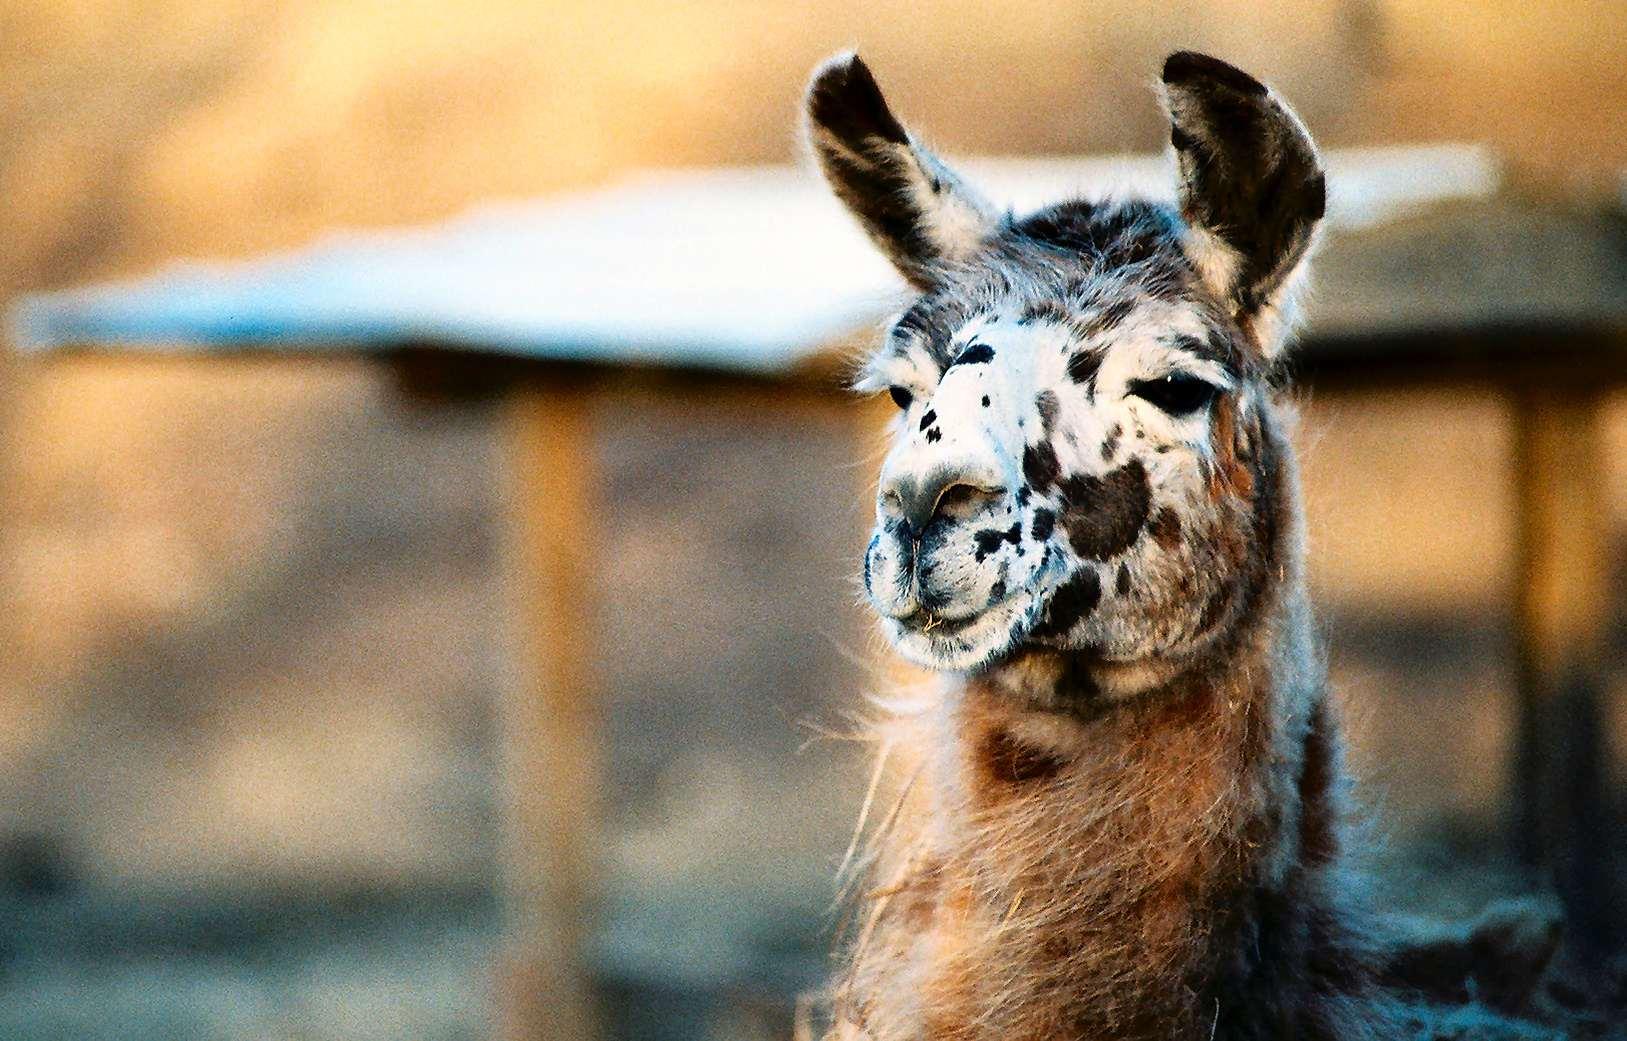 Tierfotografie eines Lamas im Zoo